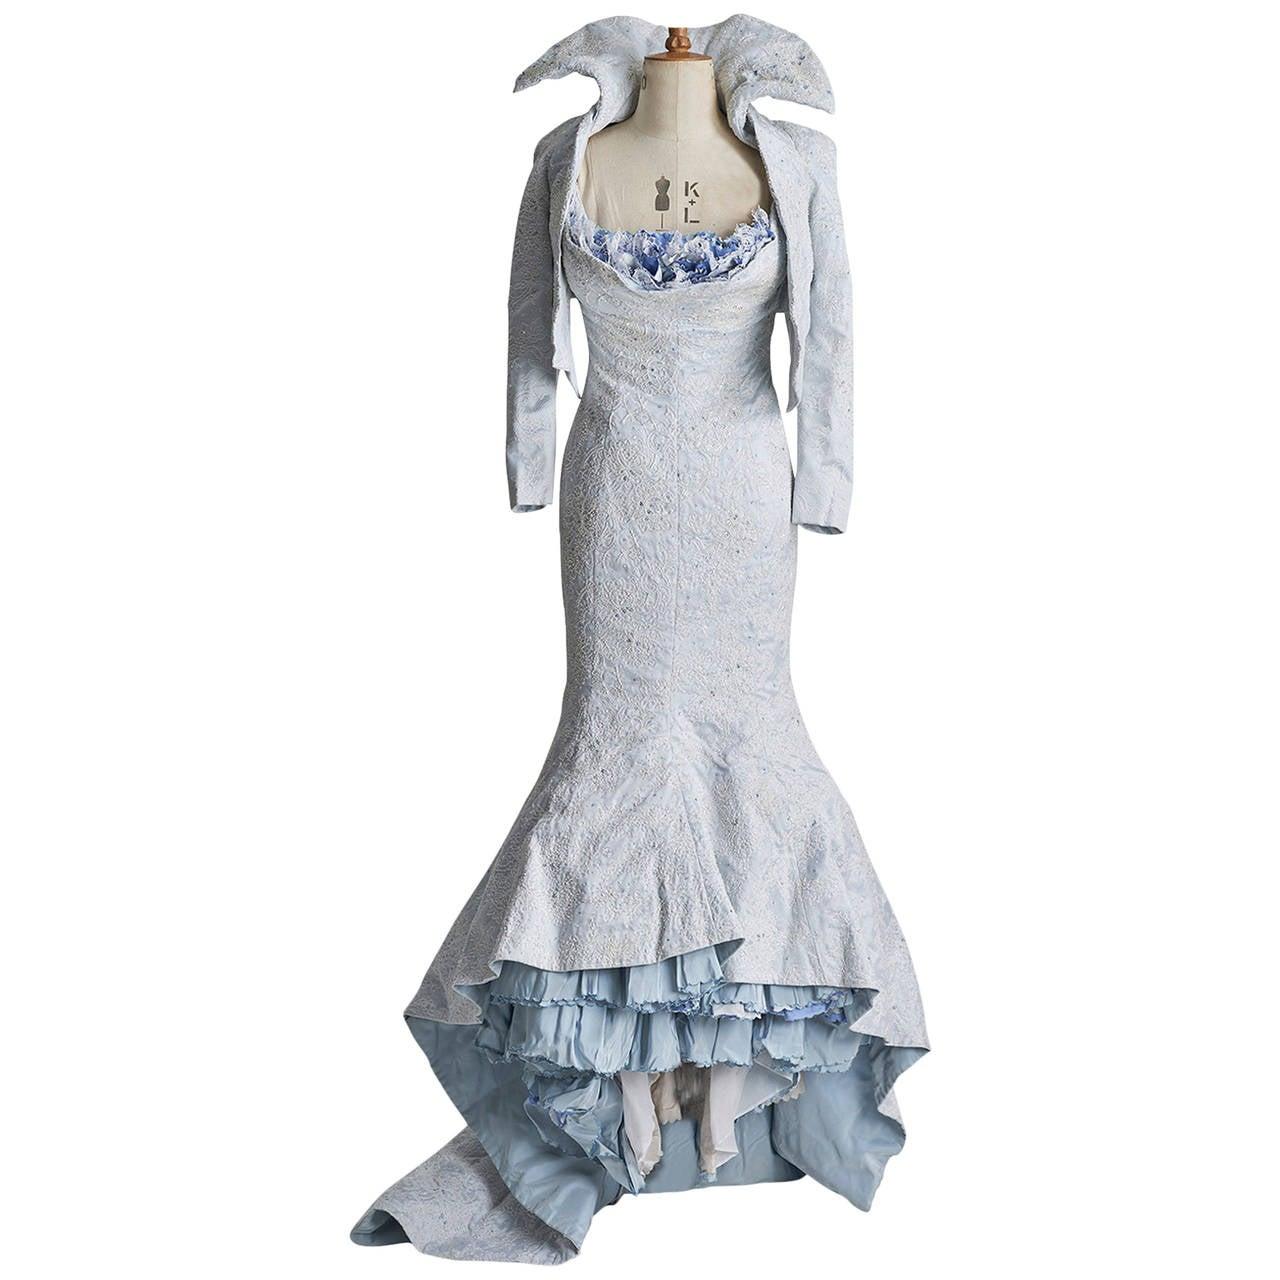 Vivienne Westwood Custom Made Wedding Gown At 1stdibs